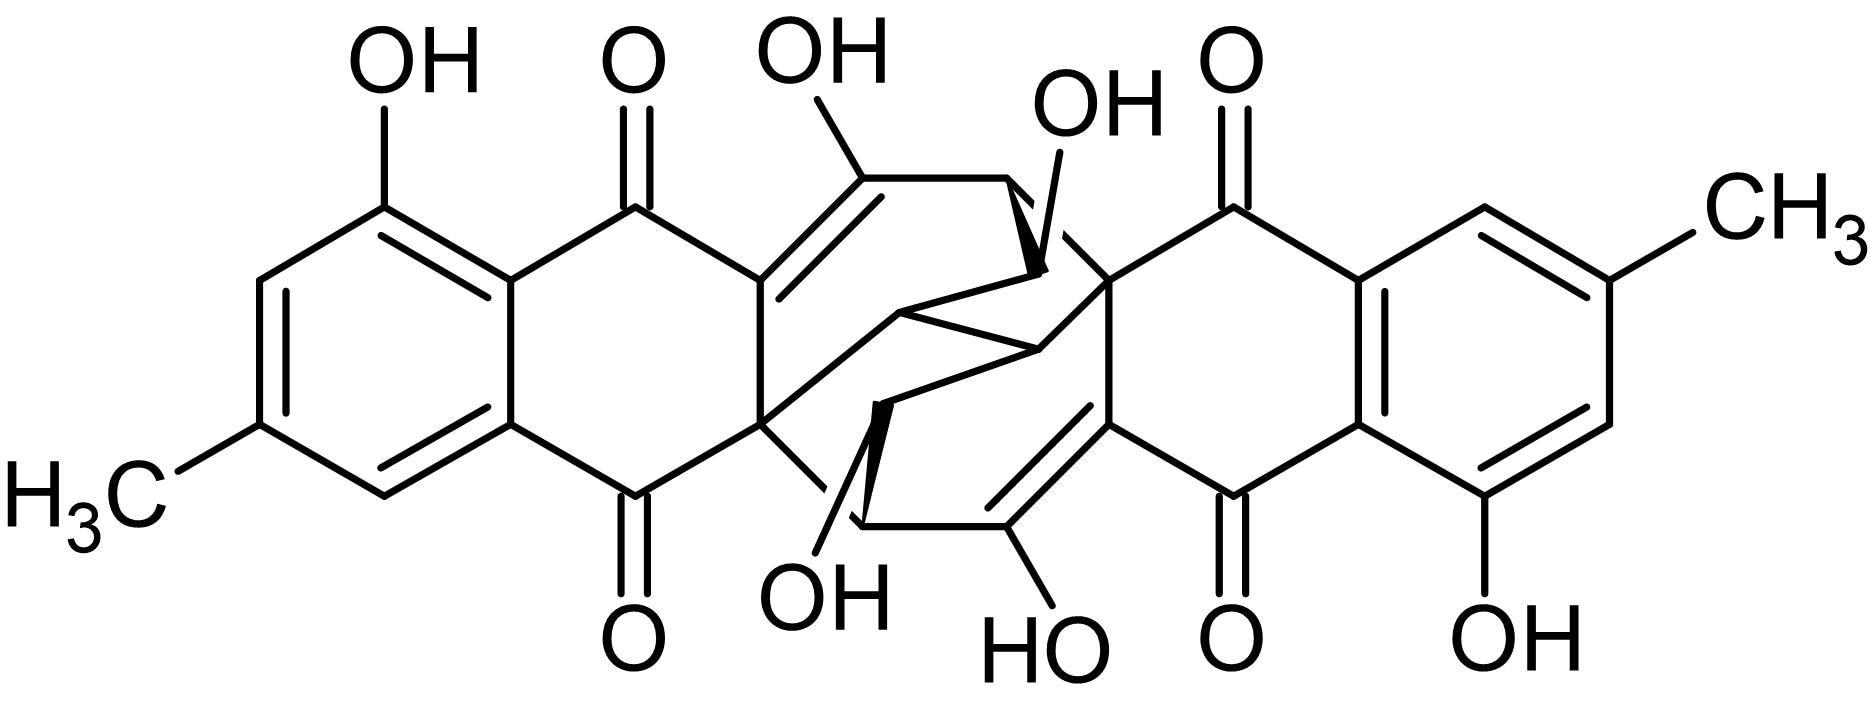 Chemical Structure - Rugulosin ((+)-Rugulosin), RNA polymerase inhibitor (ab144351)